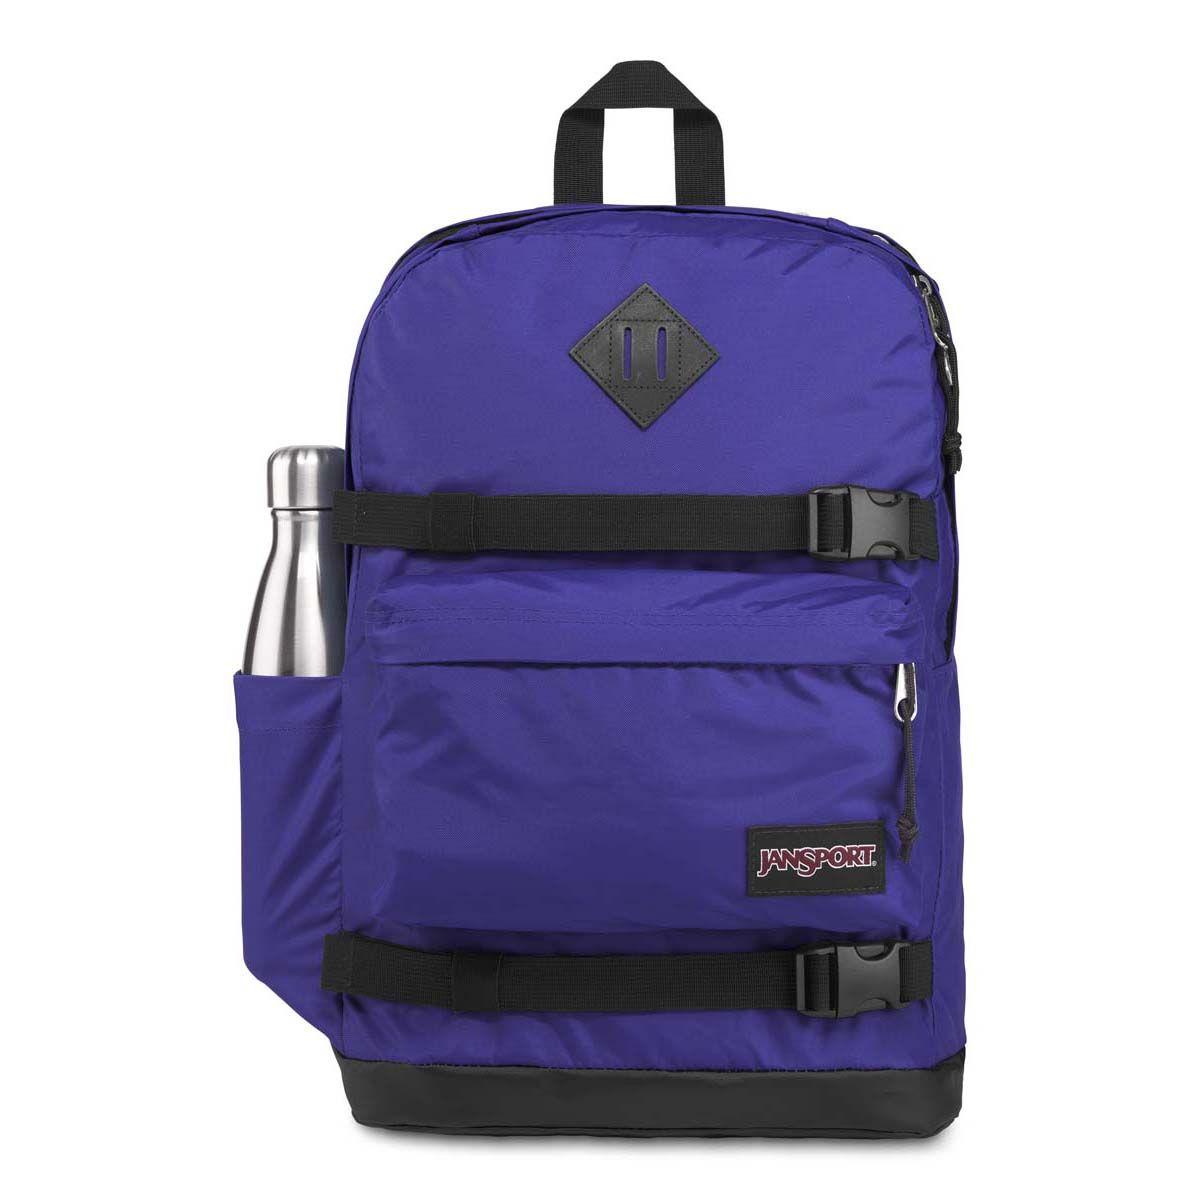 JanSport West Break Backpack in Violet Purple